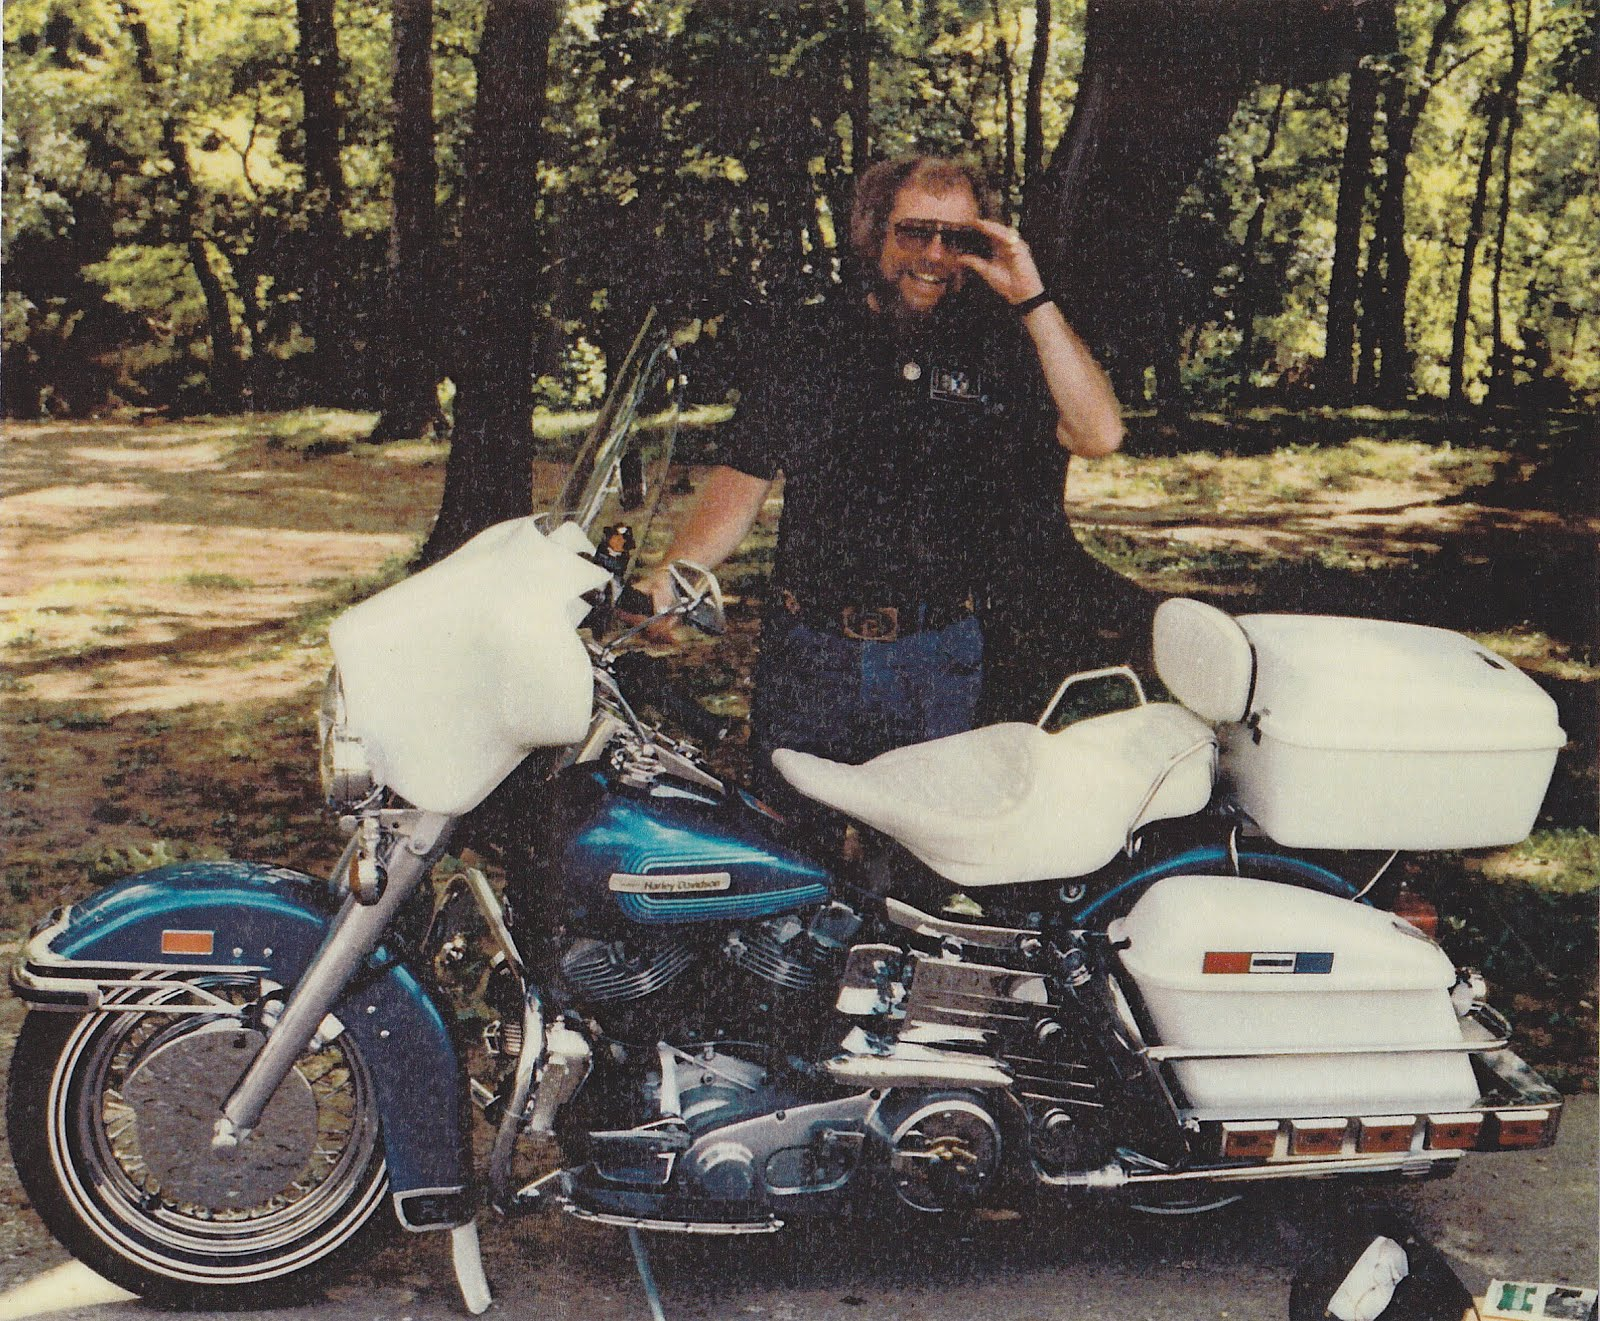 Willie G Davidson: Www.kyairhog.com